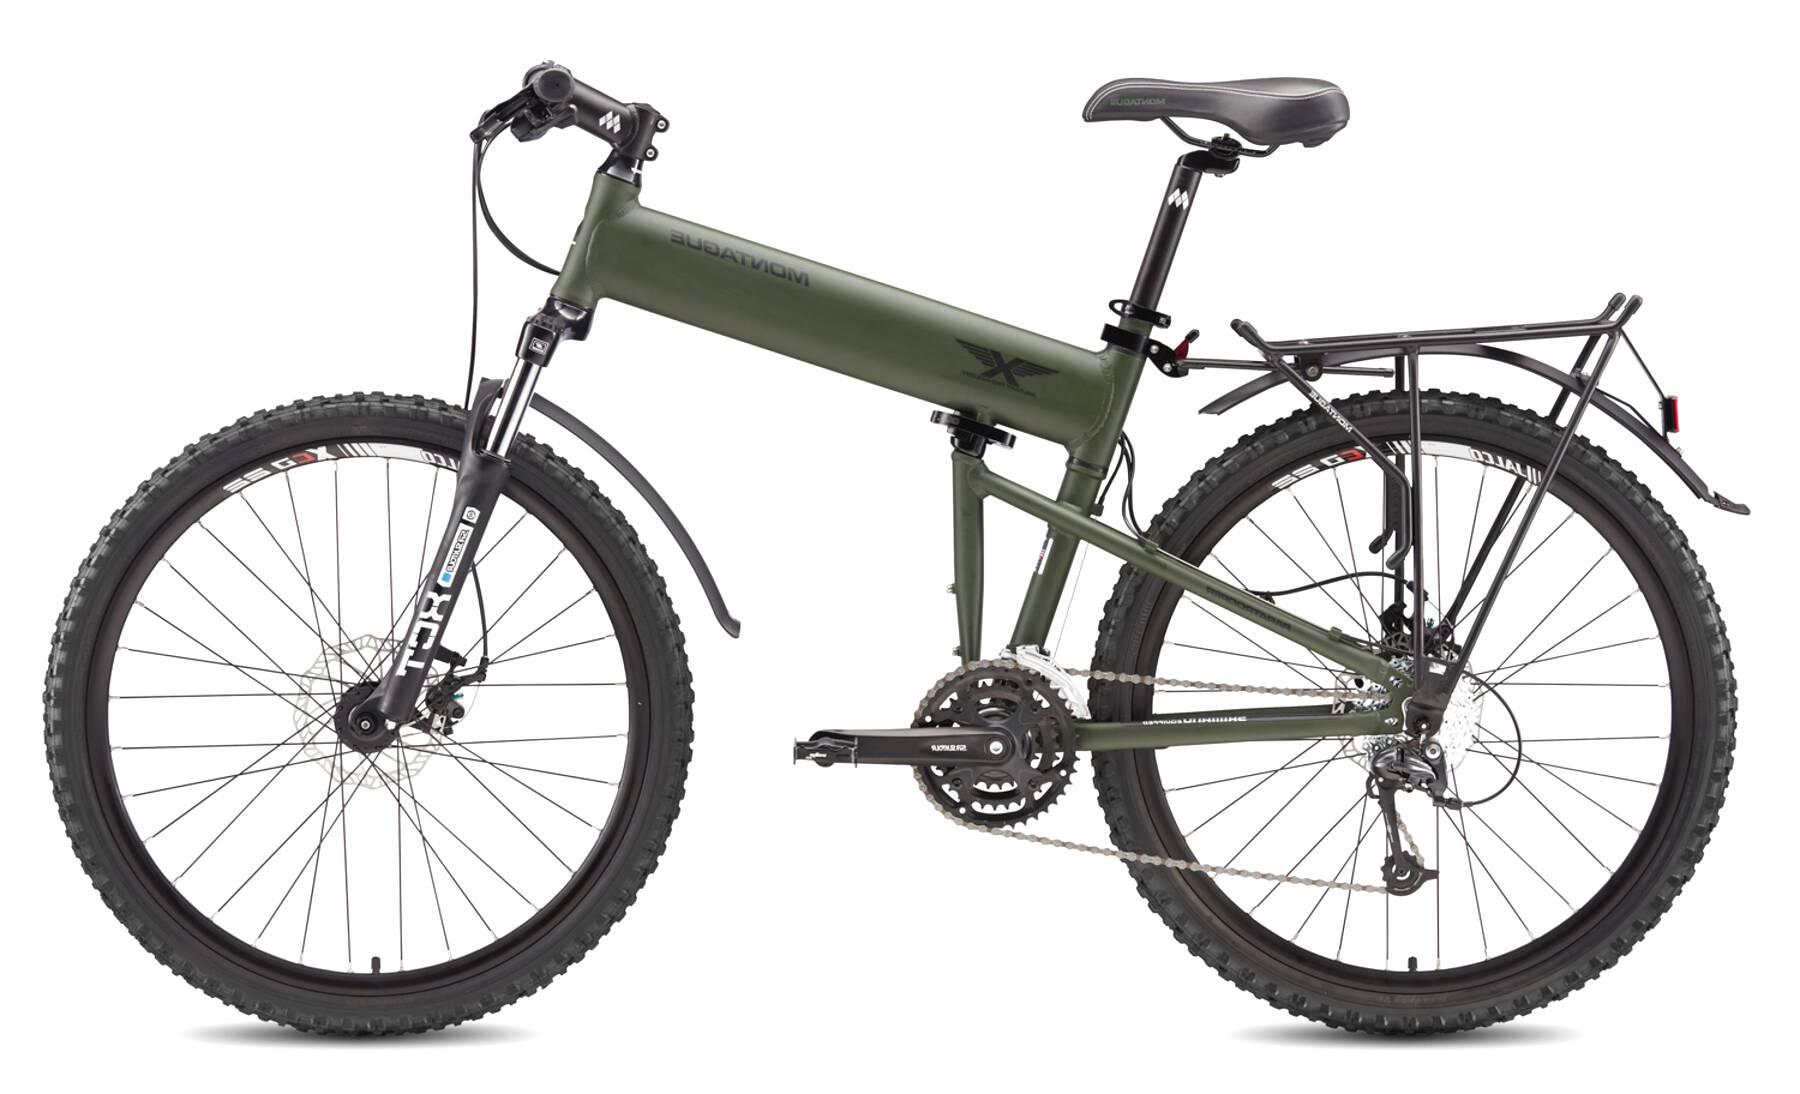 montague bike for sale